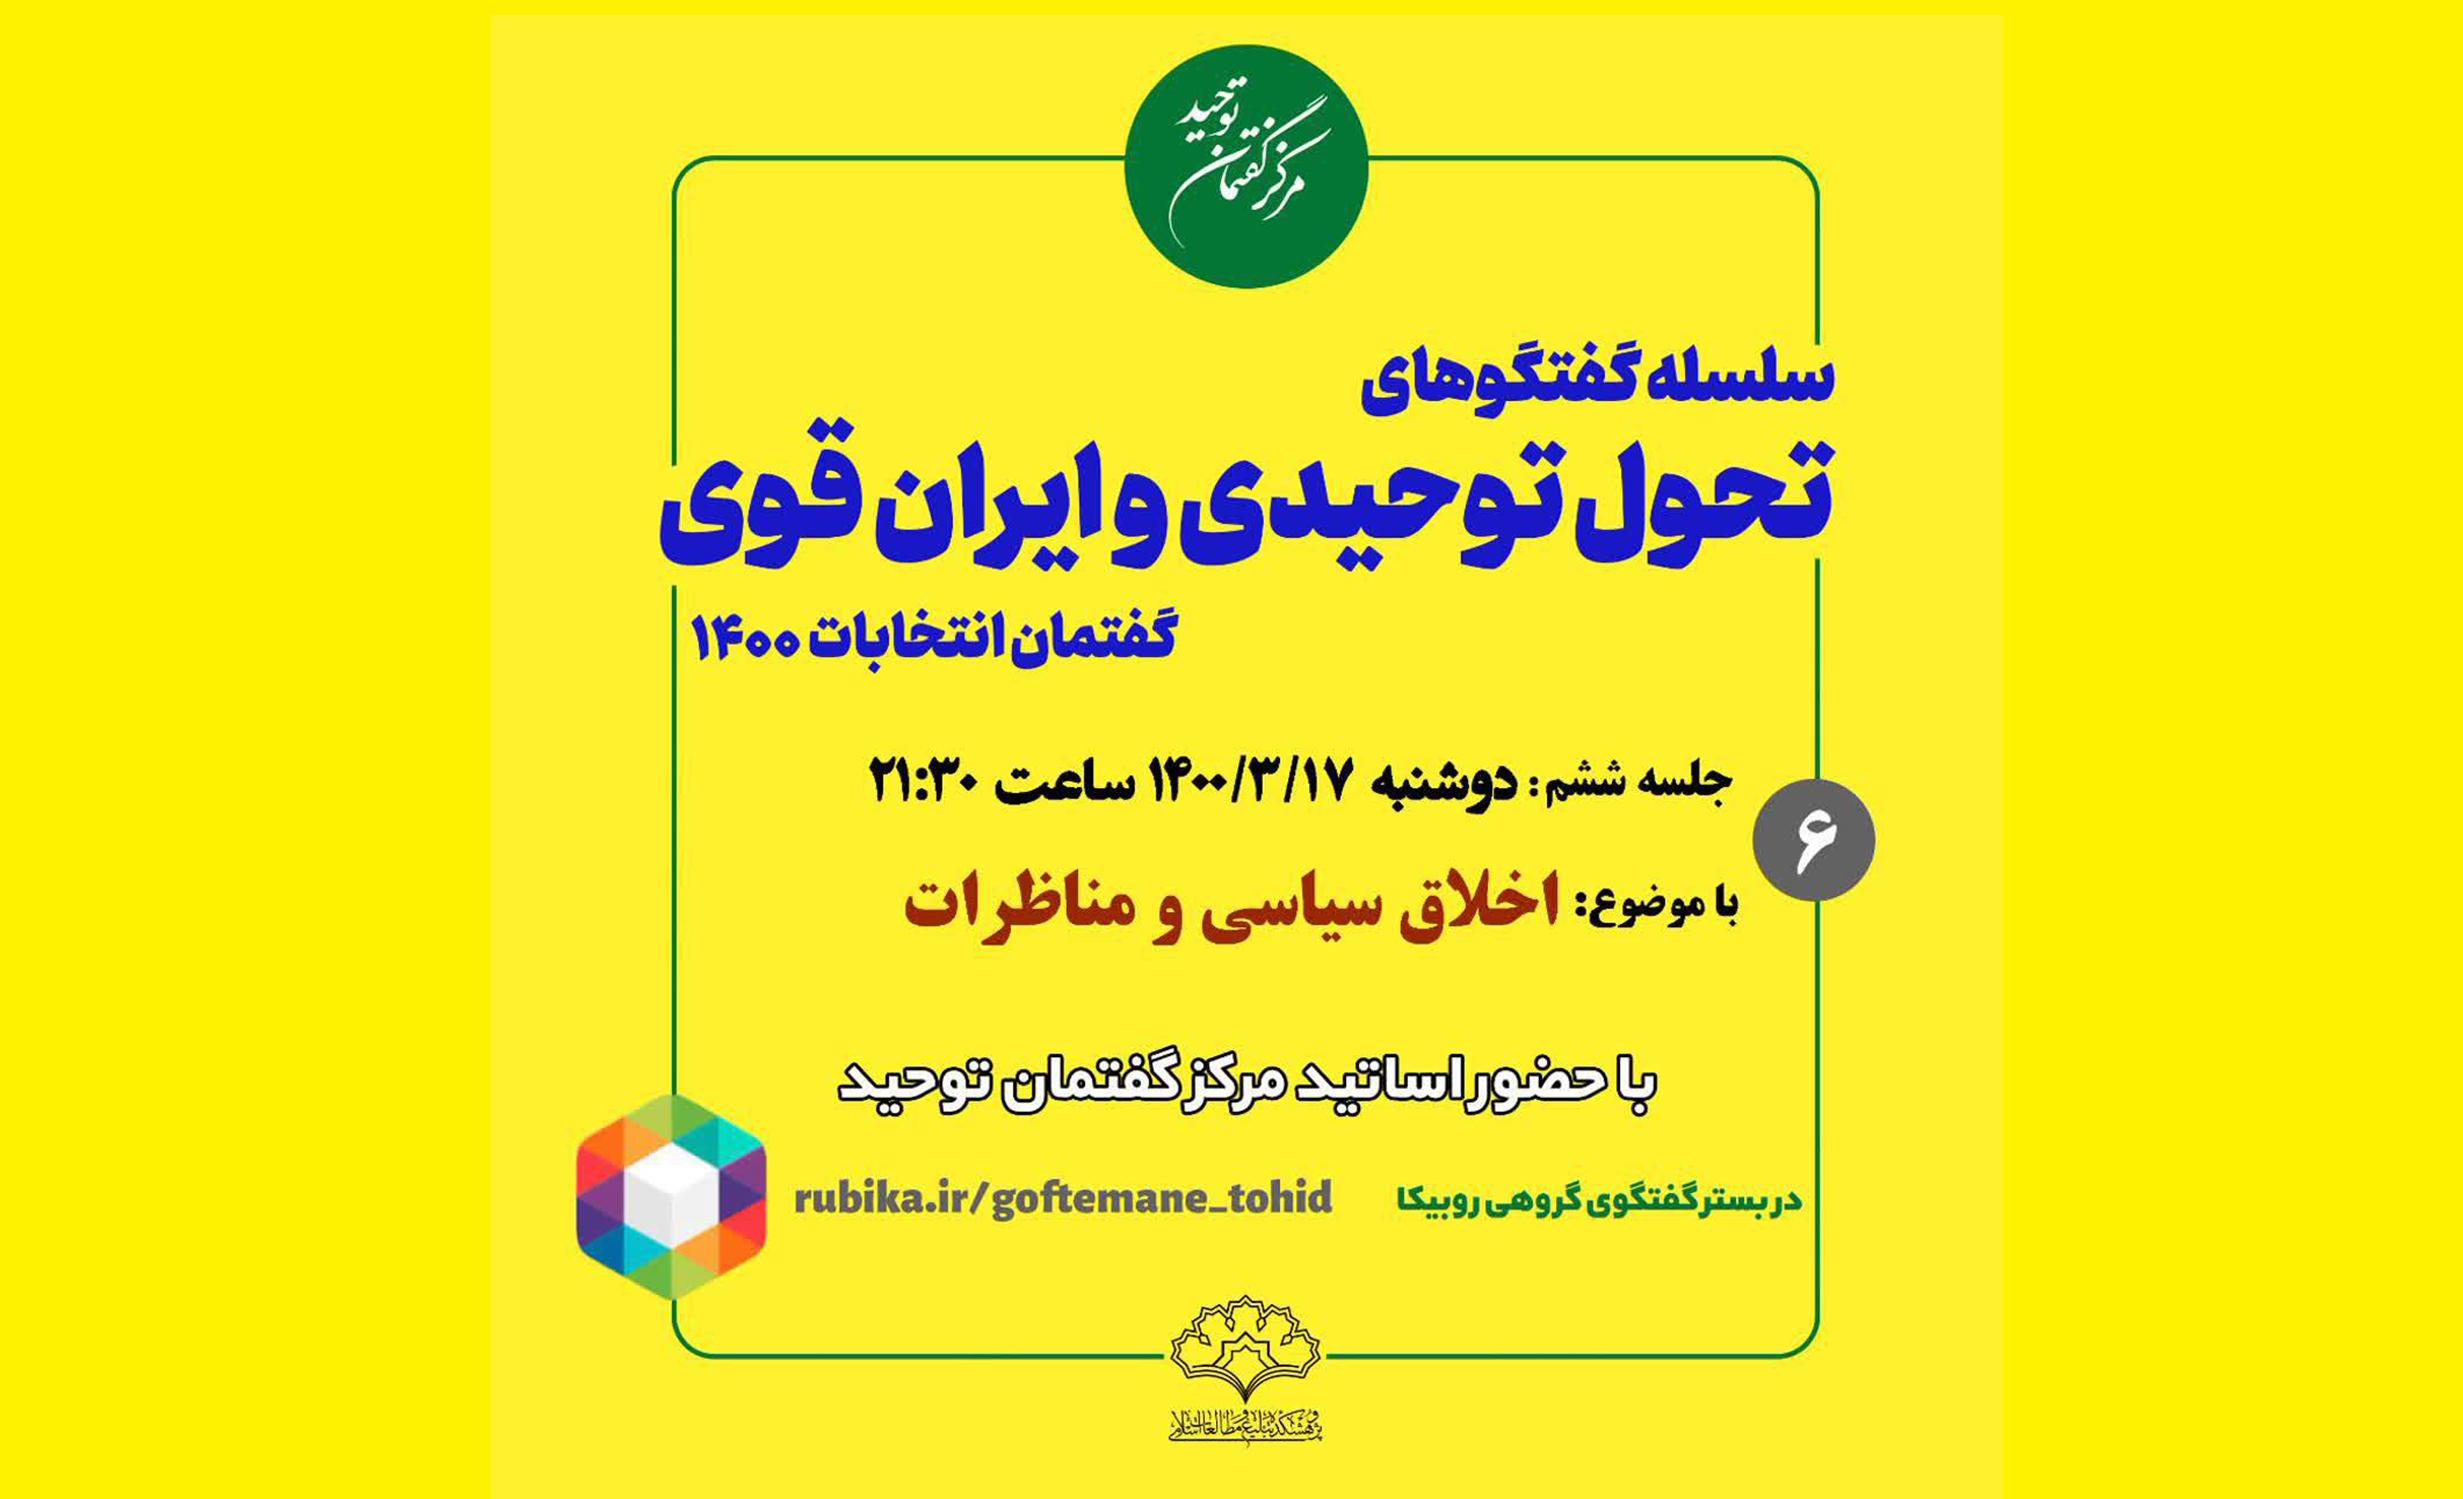 سلسله گفتگوهای گروهی تحول توحیدی و ایران قوی